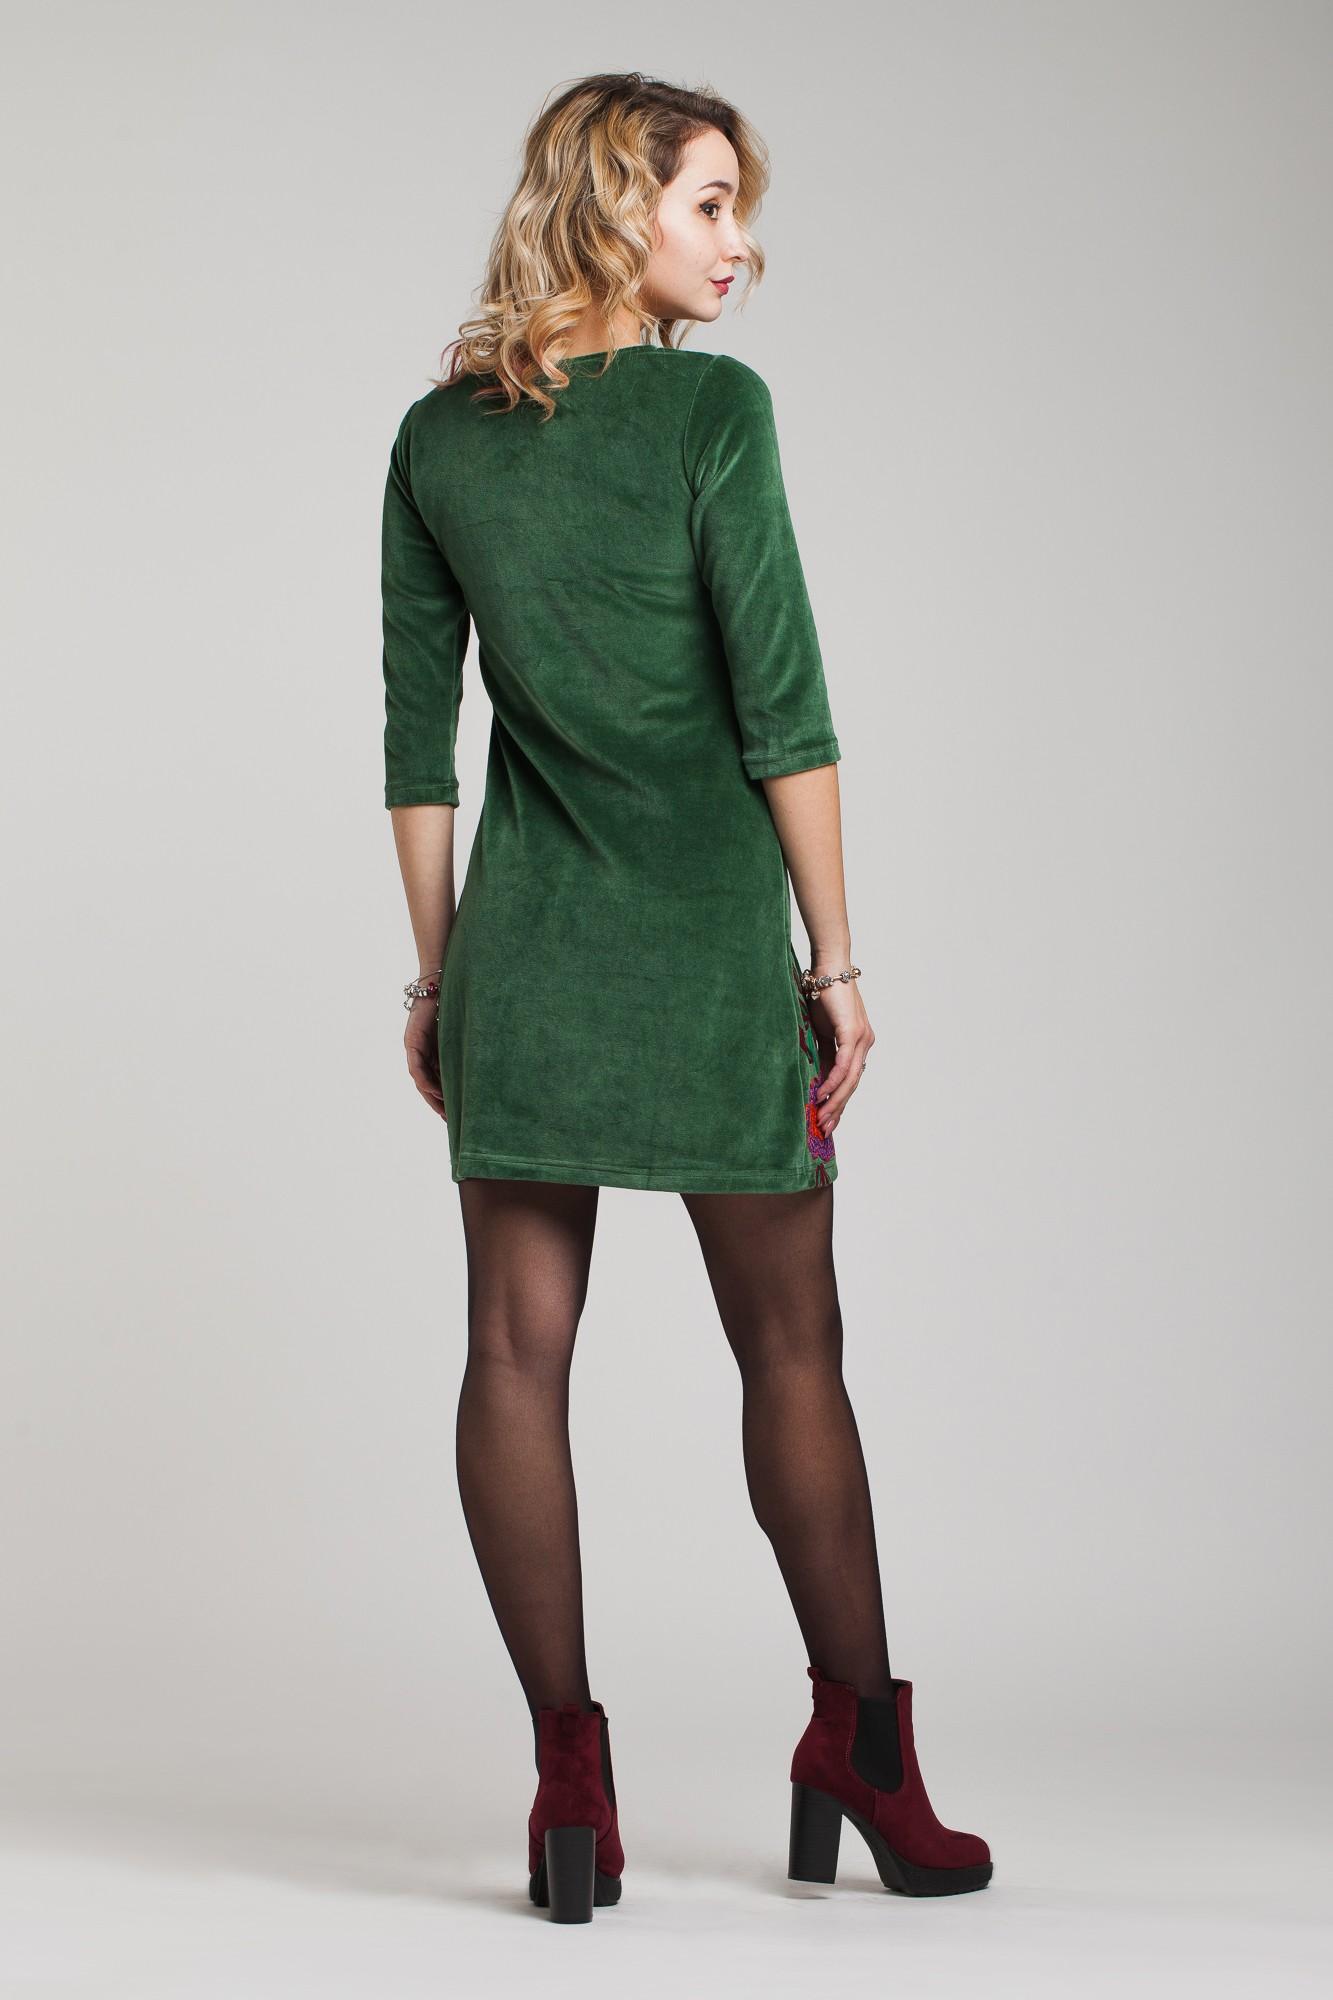 Rochie din catifea verde cu broderie multicolora